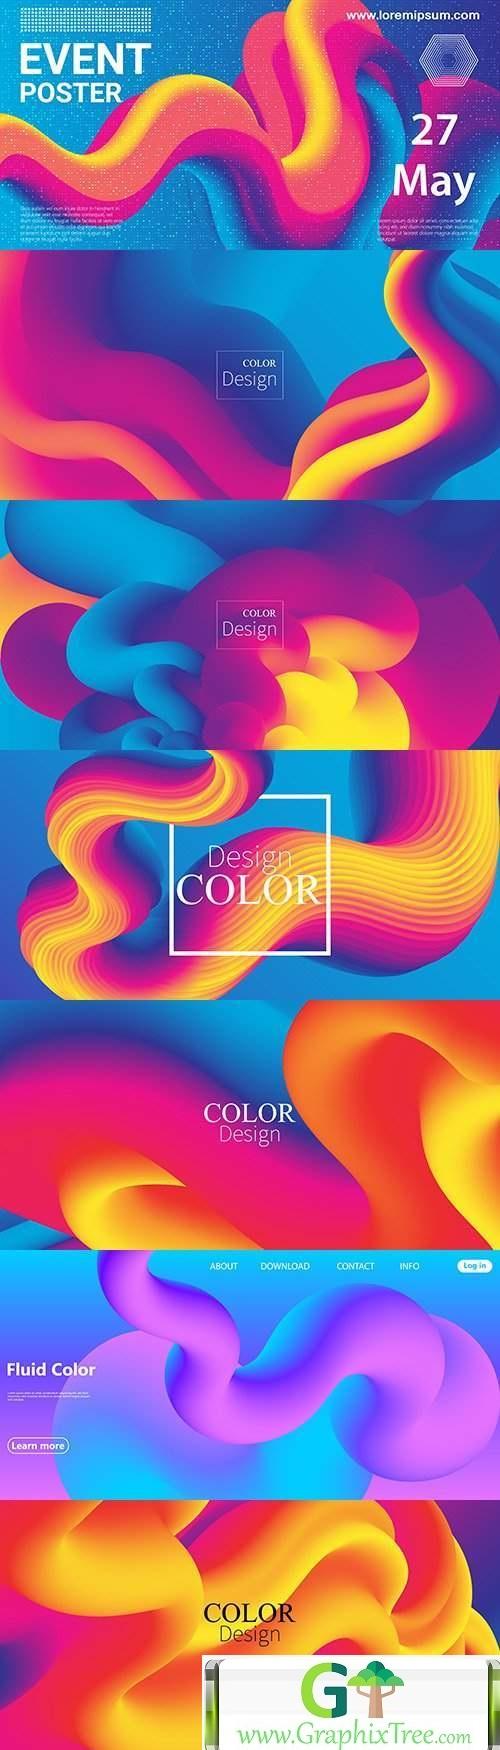 Liquid 3d abstract motion futuristic design background